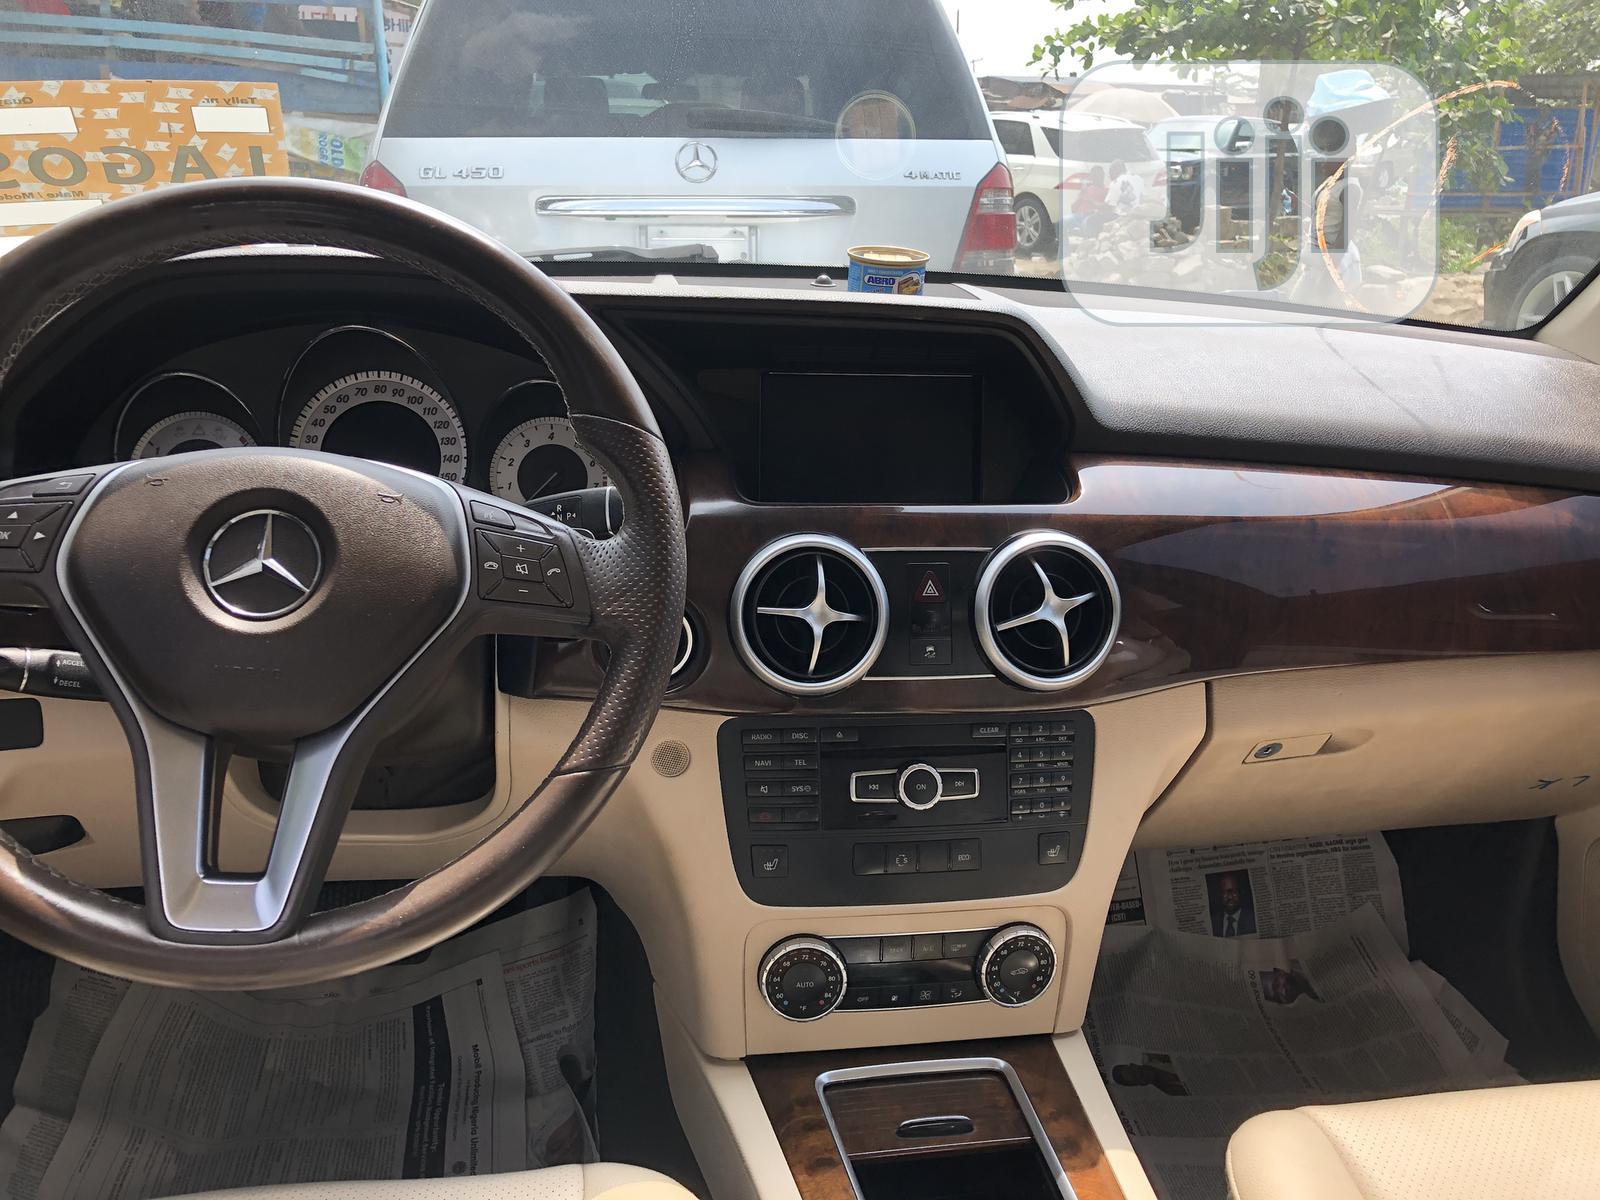 Mercedes-Benz GLK-Class 2015 White | Cars for sale in Apapa, Lagos State, Nigeria